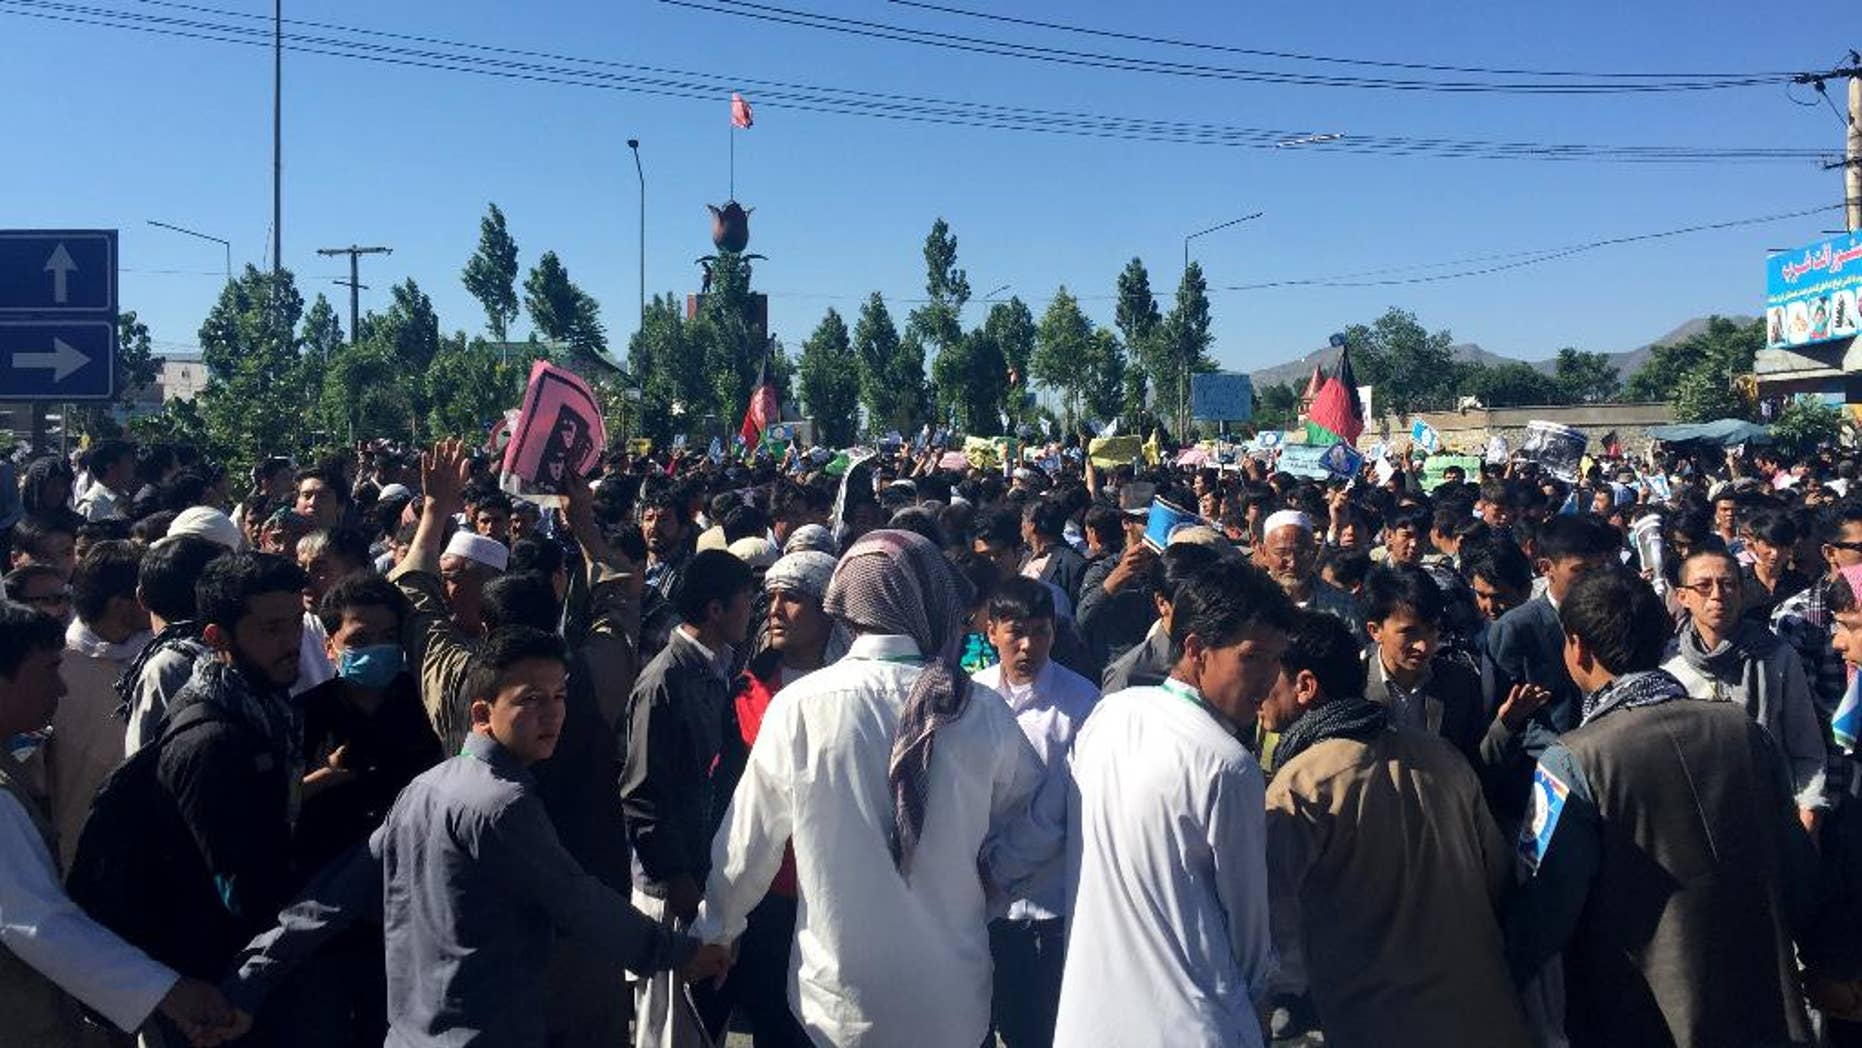 Hazara demonstrators gather to start marching toward the center of Kabul.